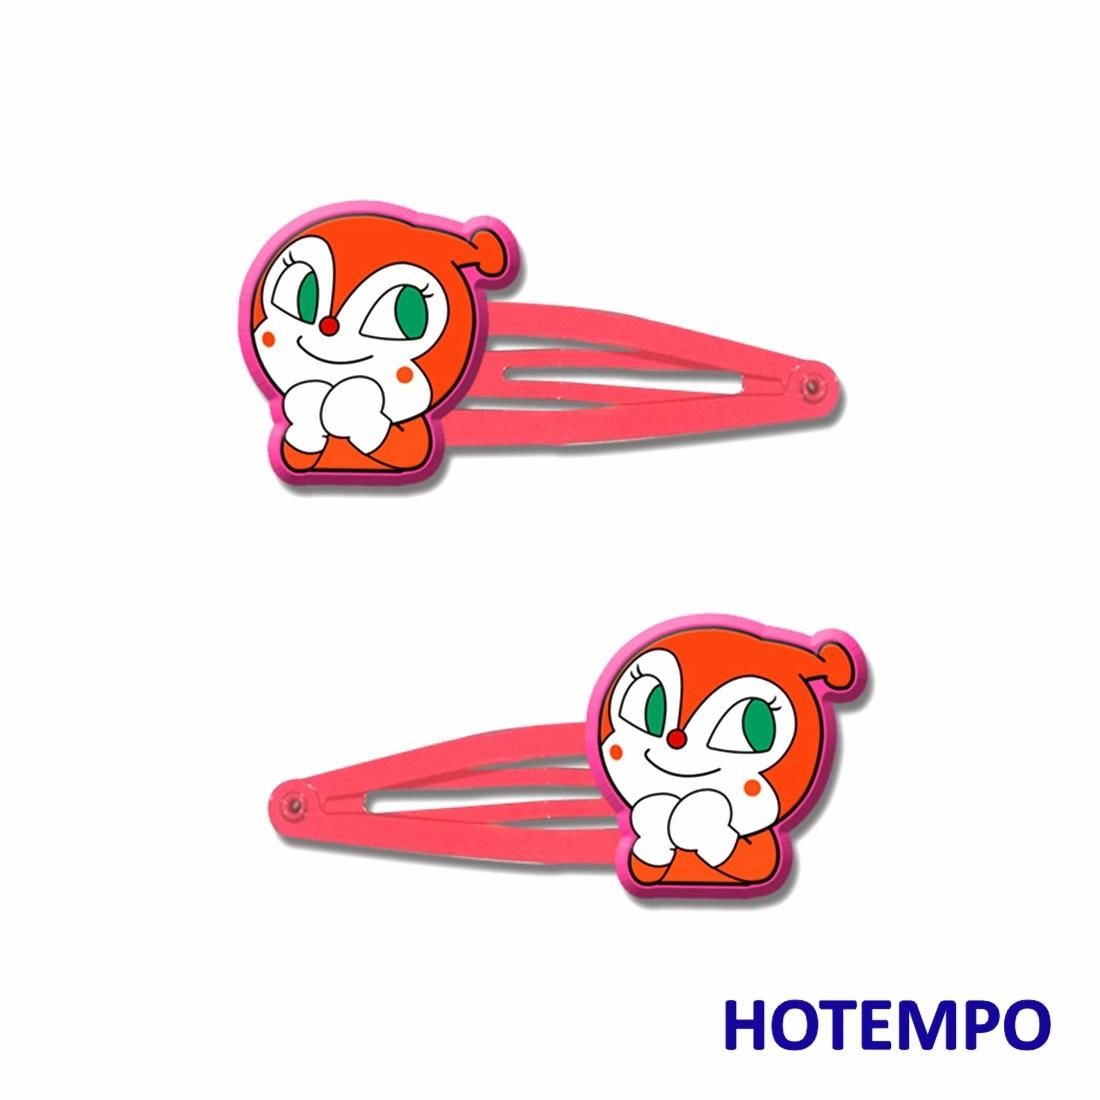 6pcs Anime Superman Anpanman Hair Accessories Dokin chan Baikinman Hair Clips for Girls Cartoon Kids 5cm Hairpin Children Barret in Hair Accessories from Mother Kids